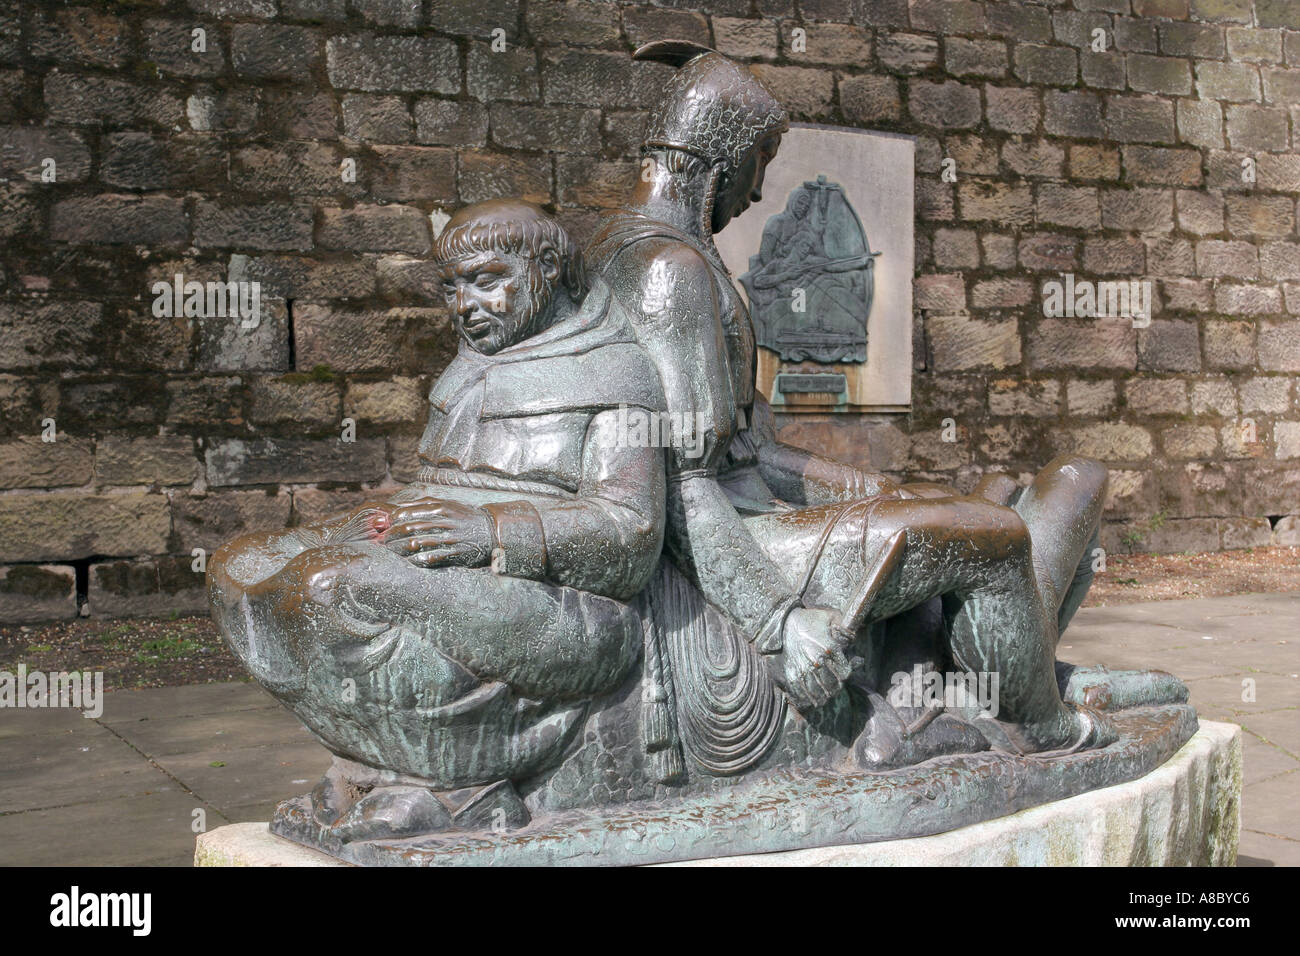 Friar Tuck Statue Nottingham - statue below Nottingham Castle - Stock Image